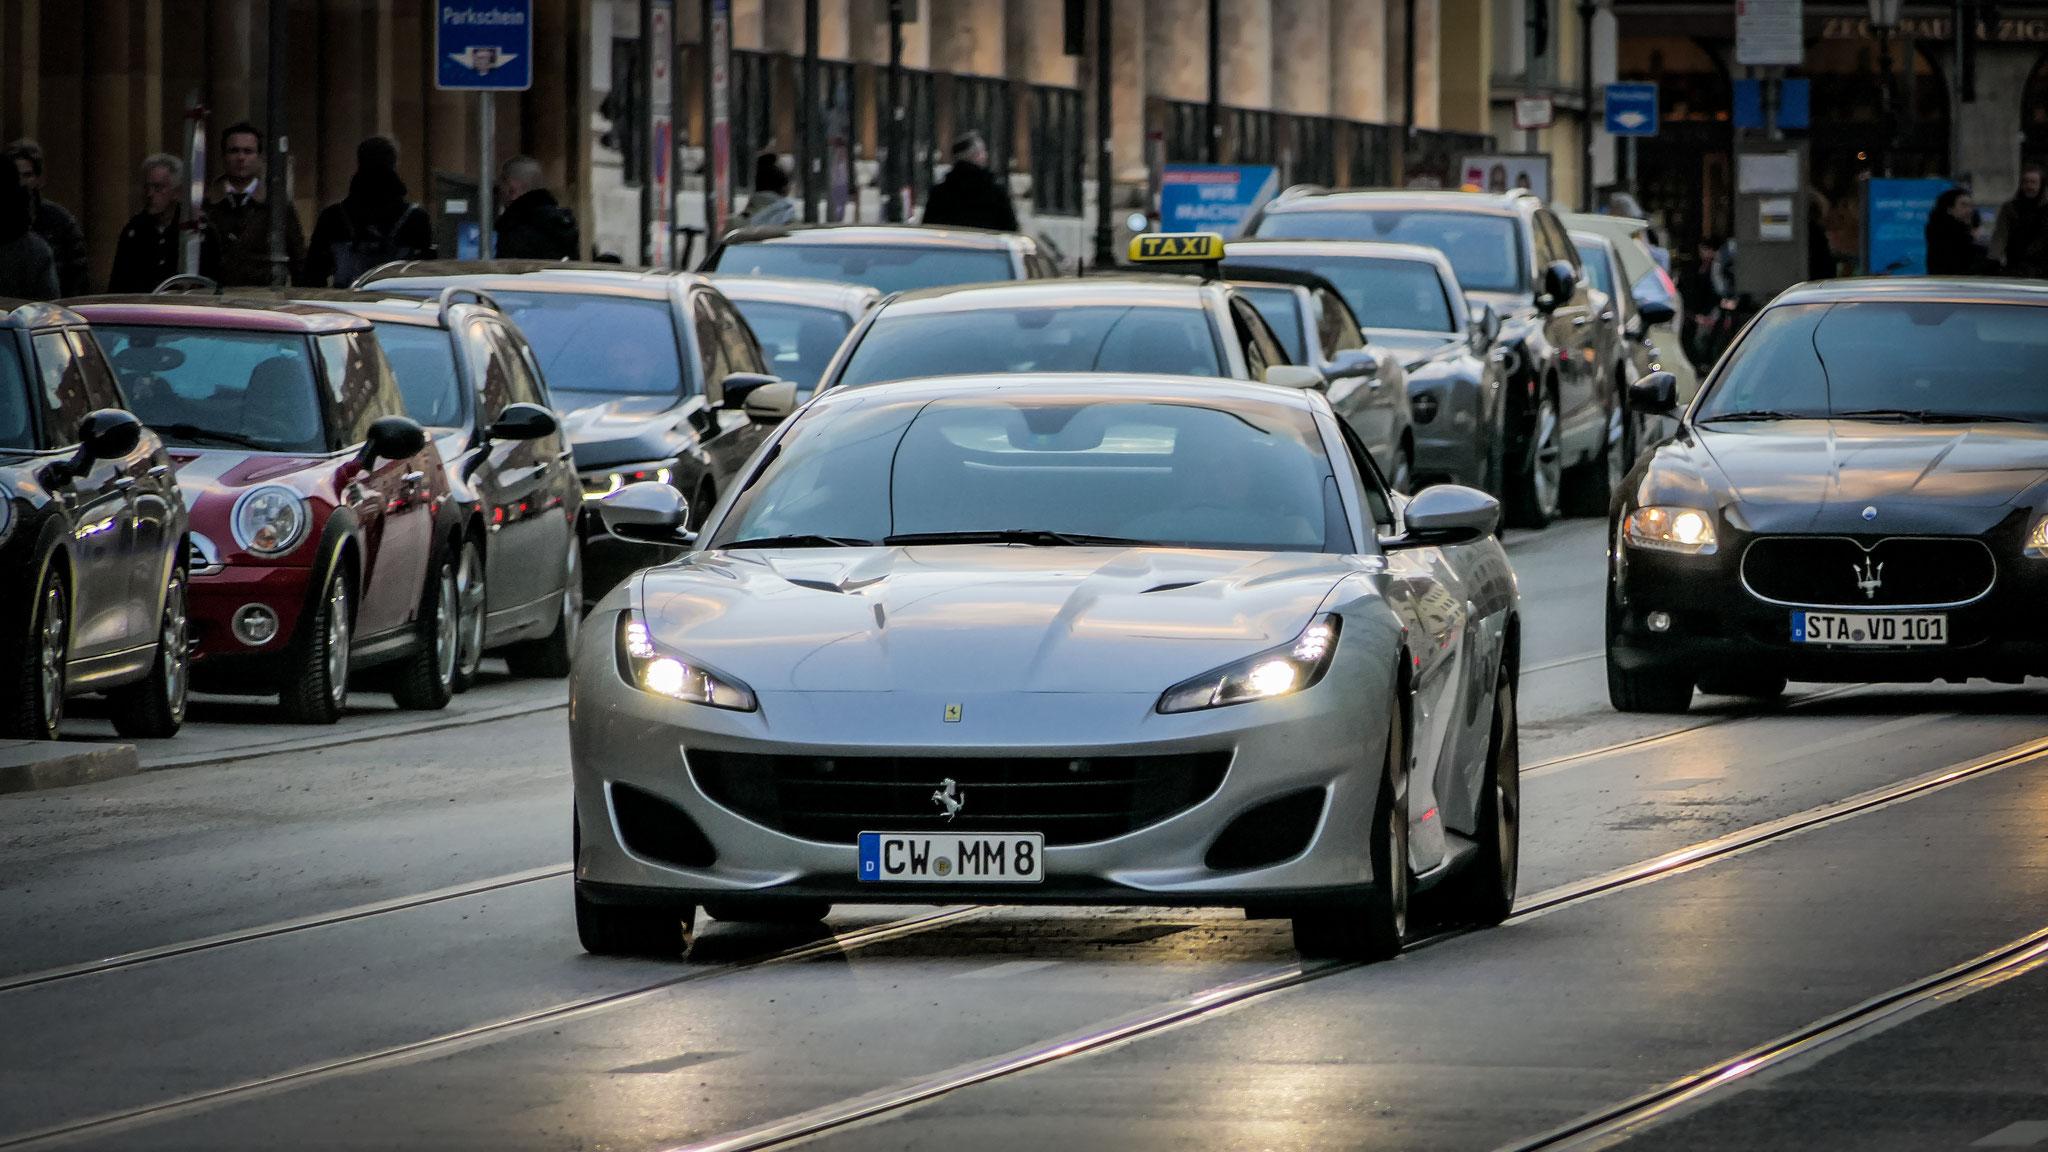 Ferrari Portofino - CW-MM-8